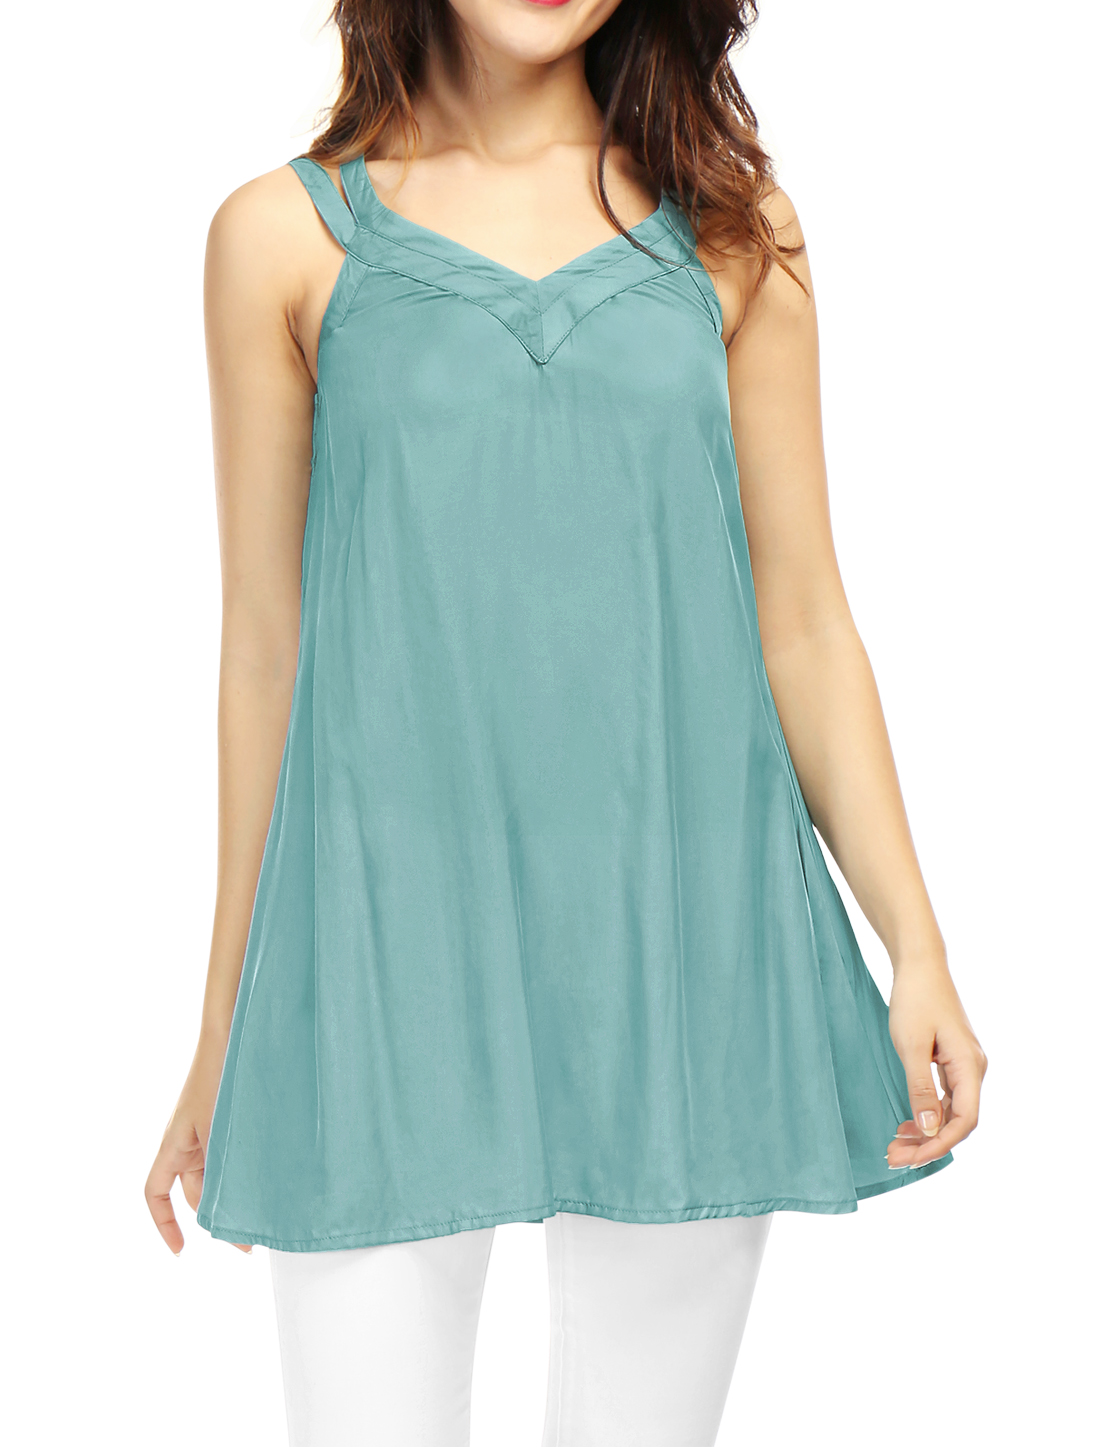 Women Sleeveless V Neckline Strappy Back Swing Tunic Top Green L